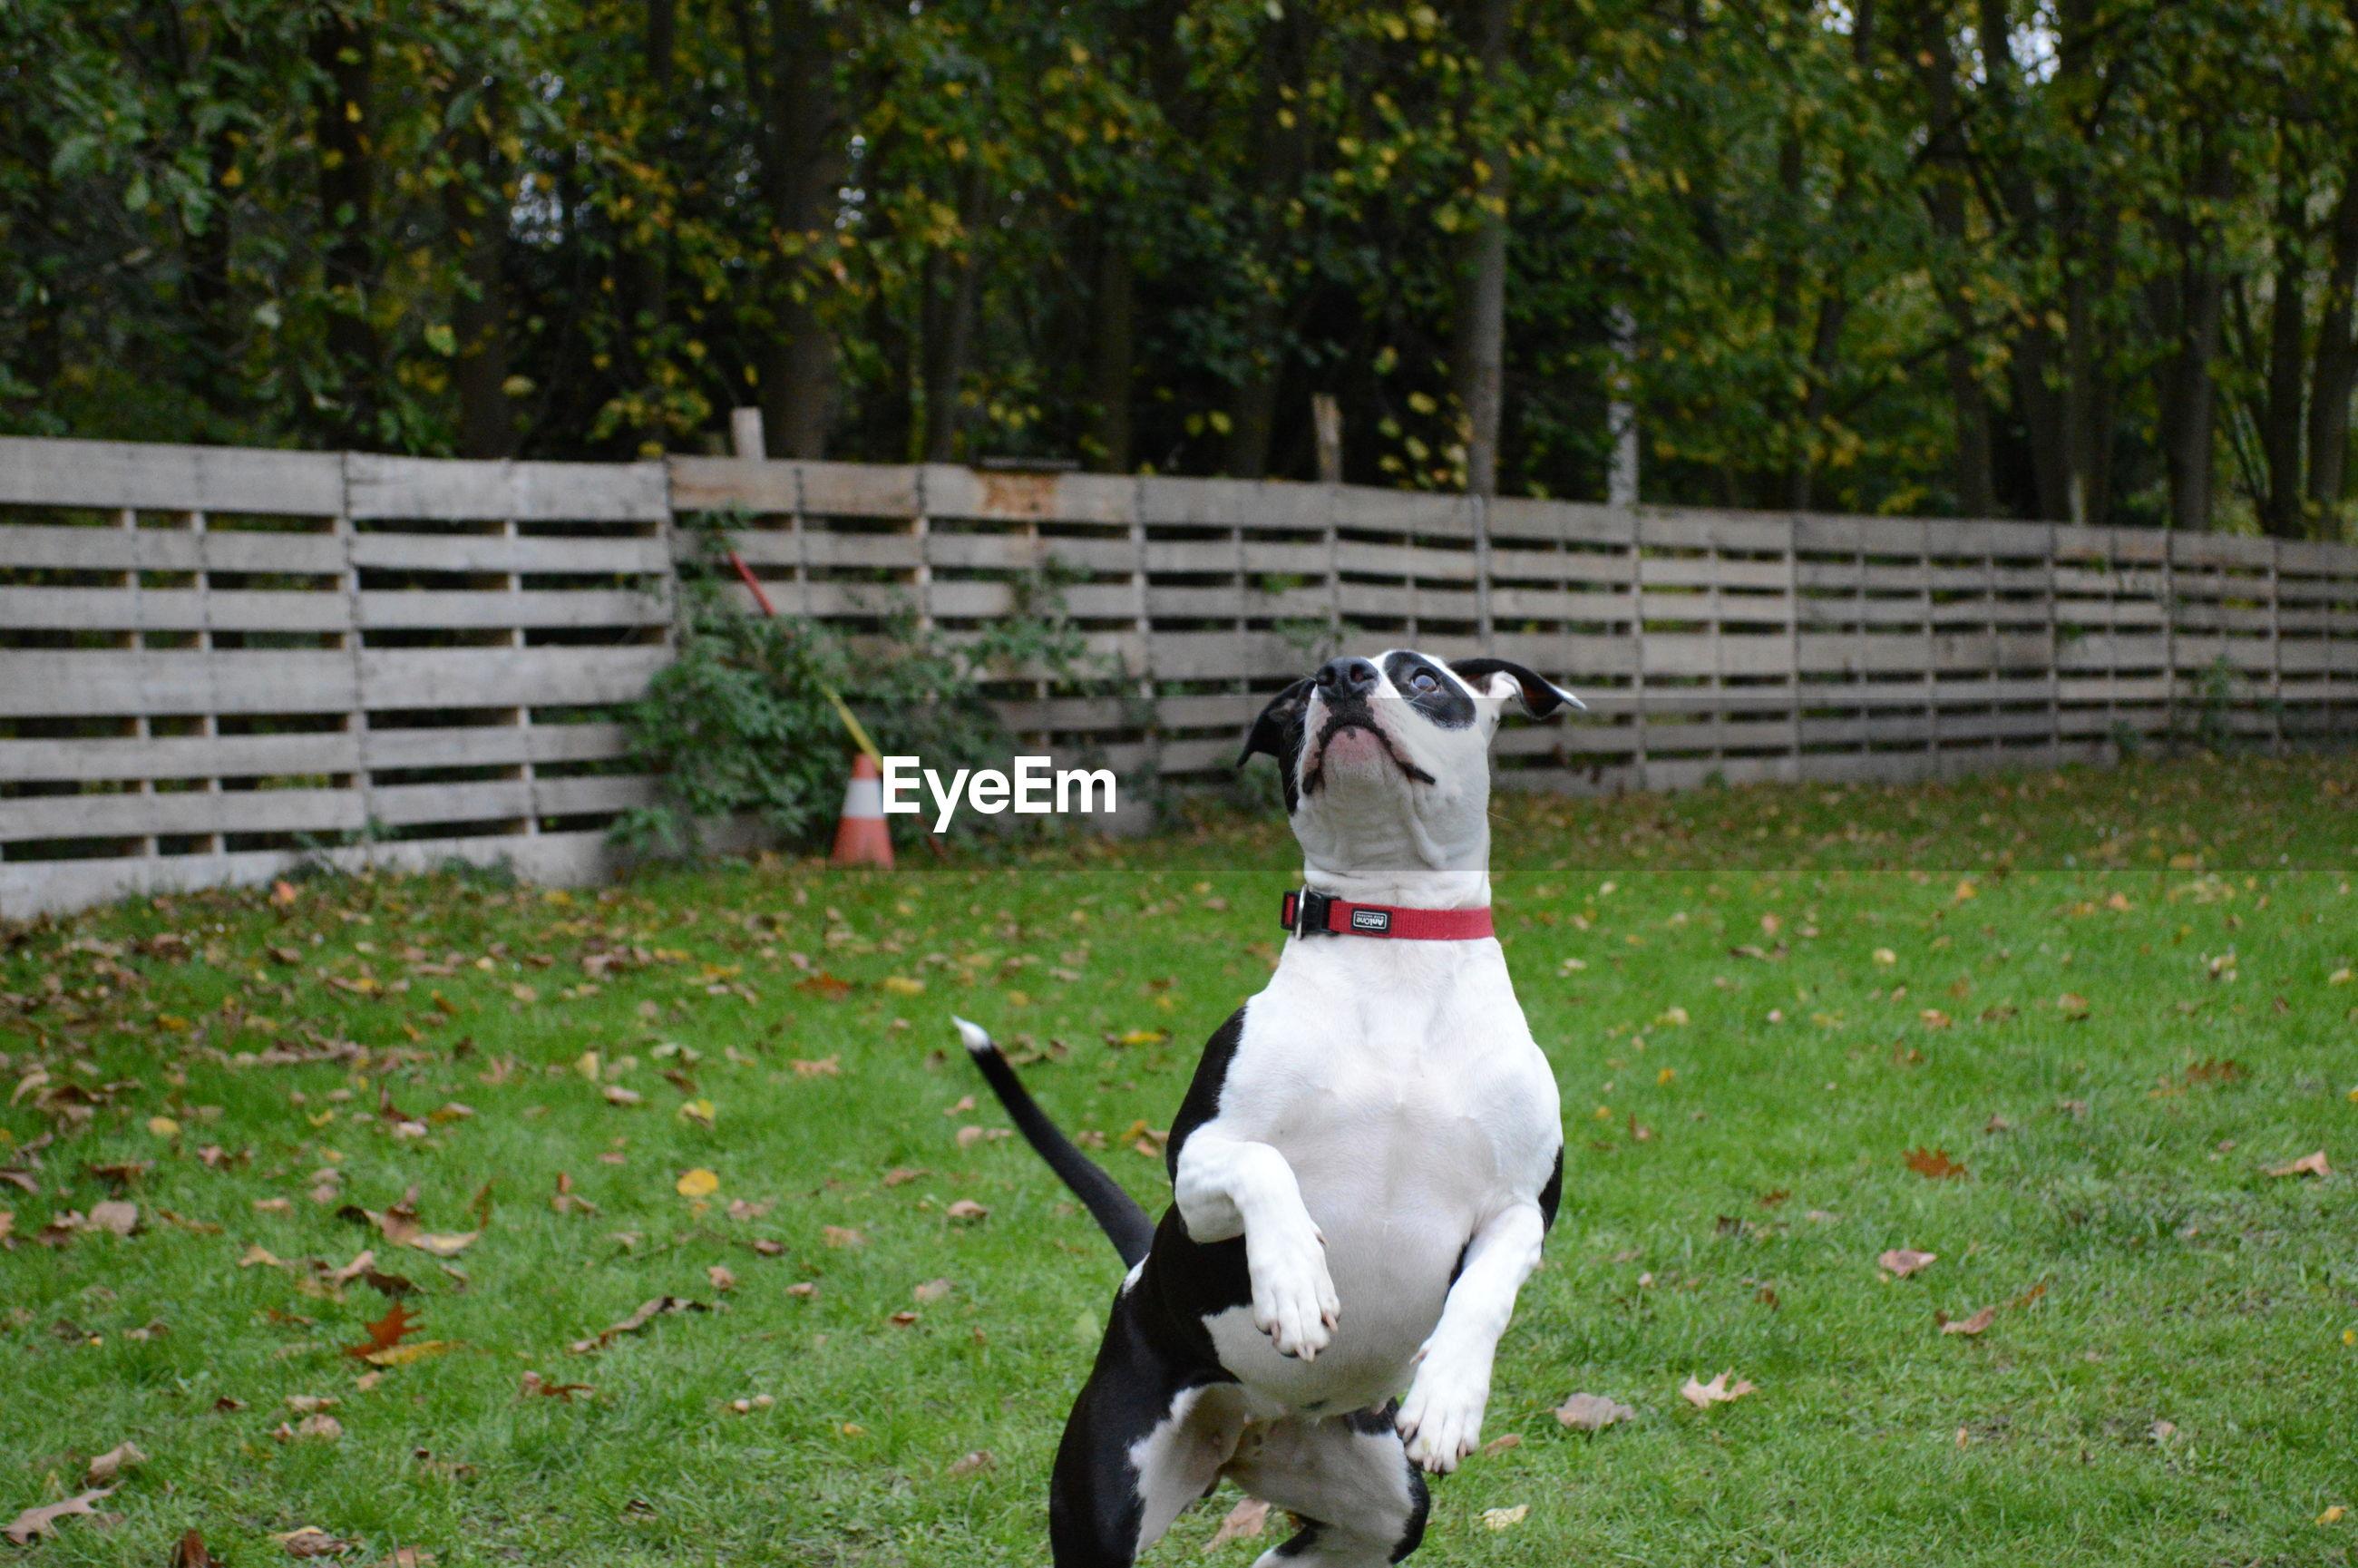 DOG SITTING ON FIELD